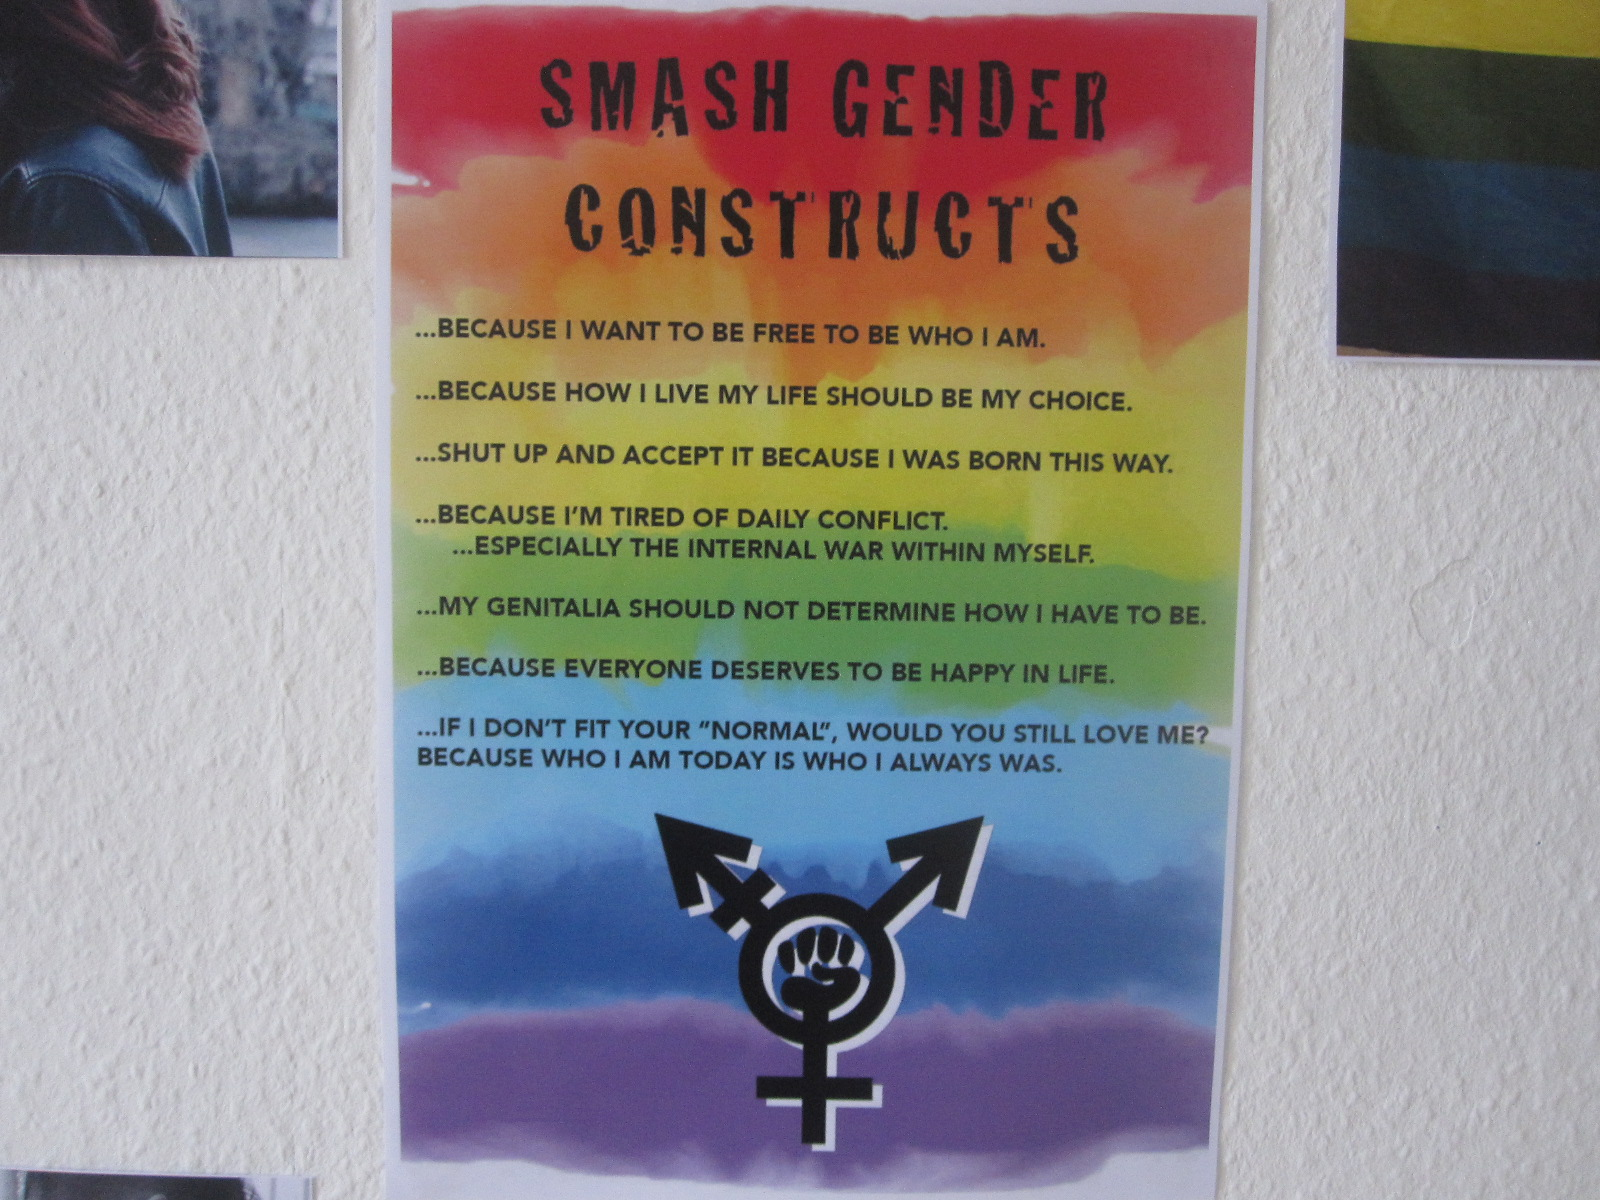 SMASH GENDER CONSTRUCTS